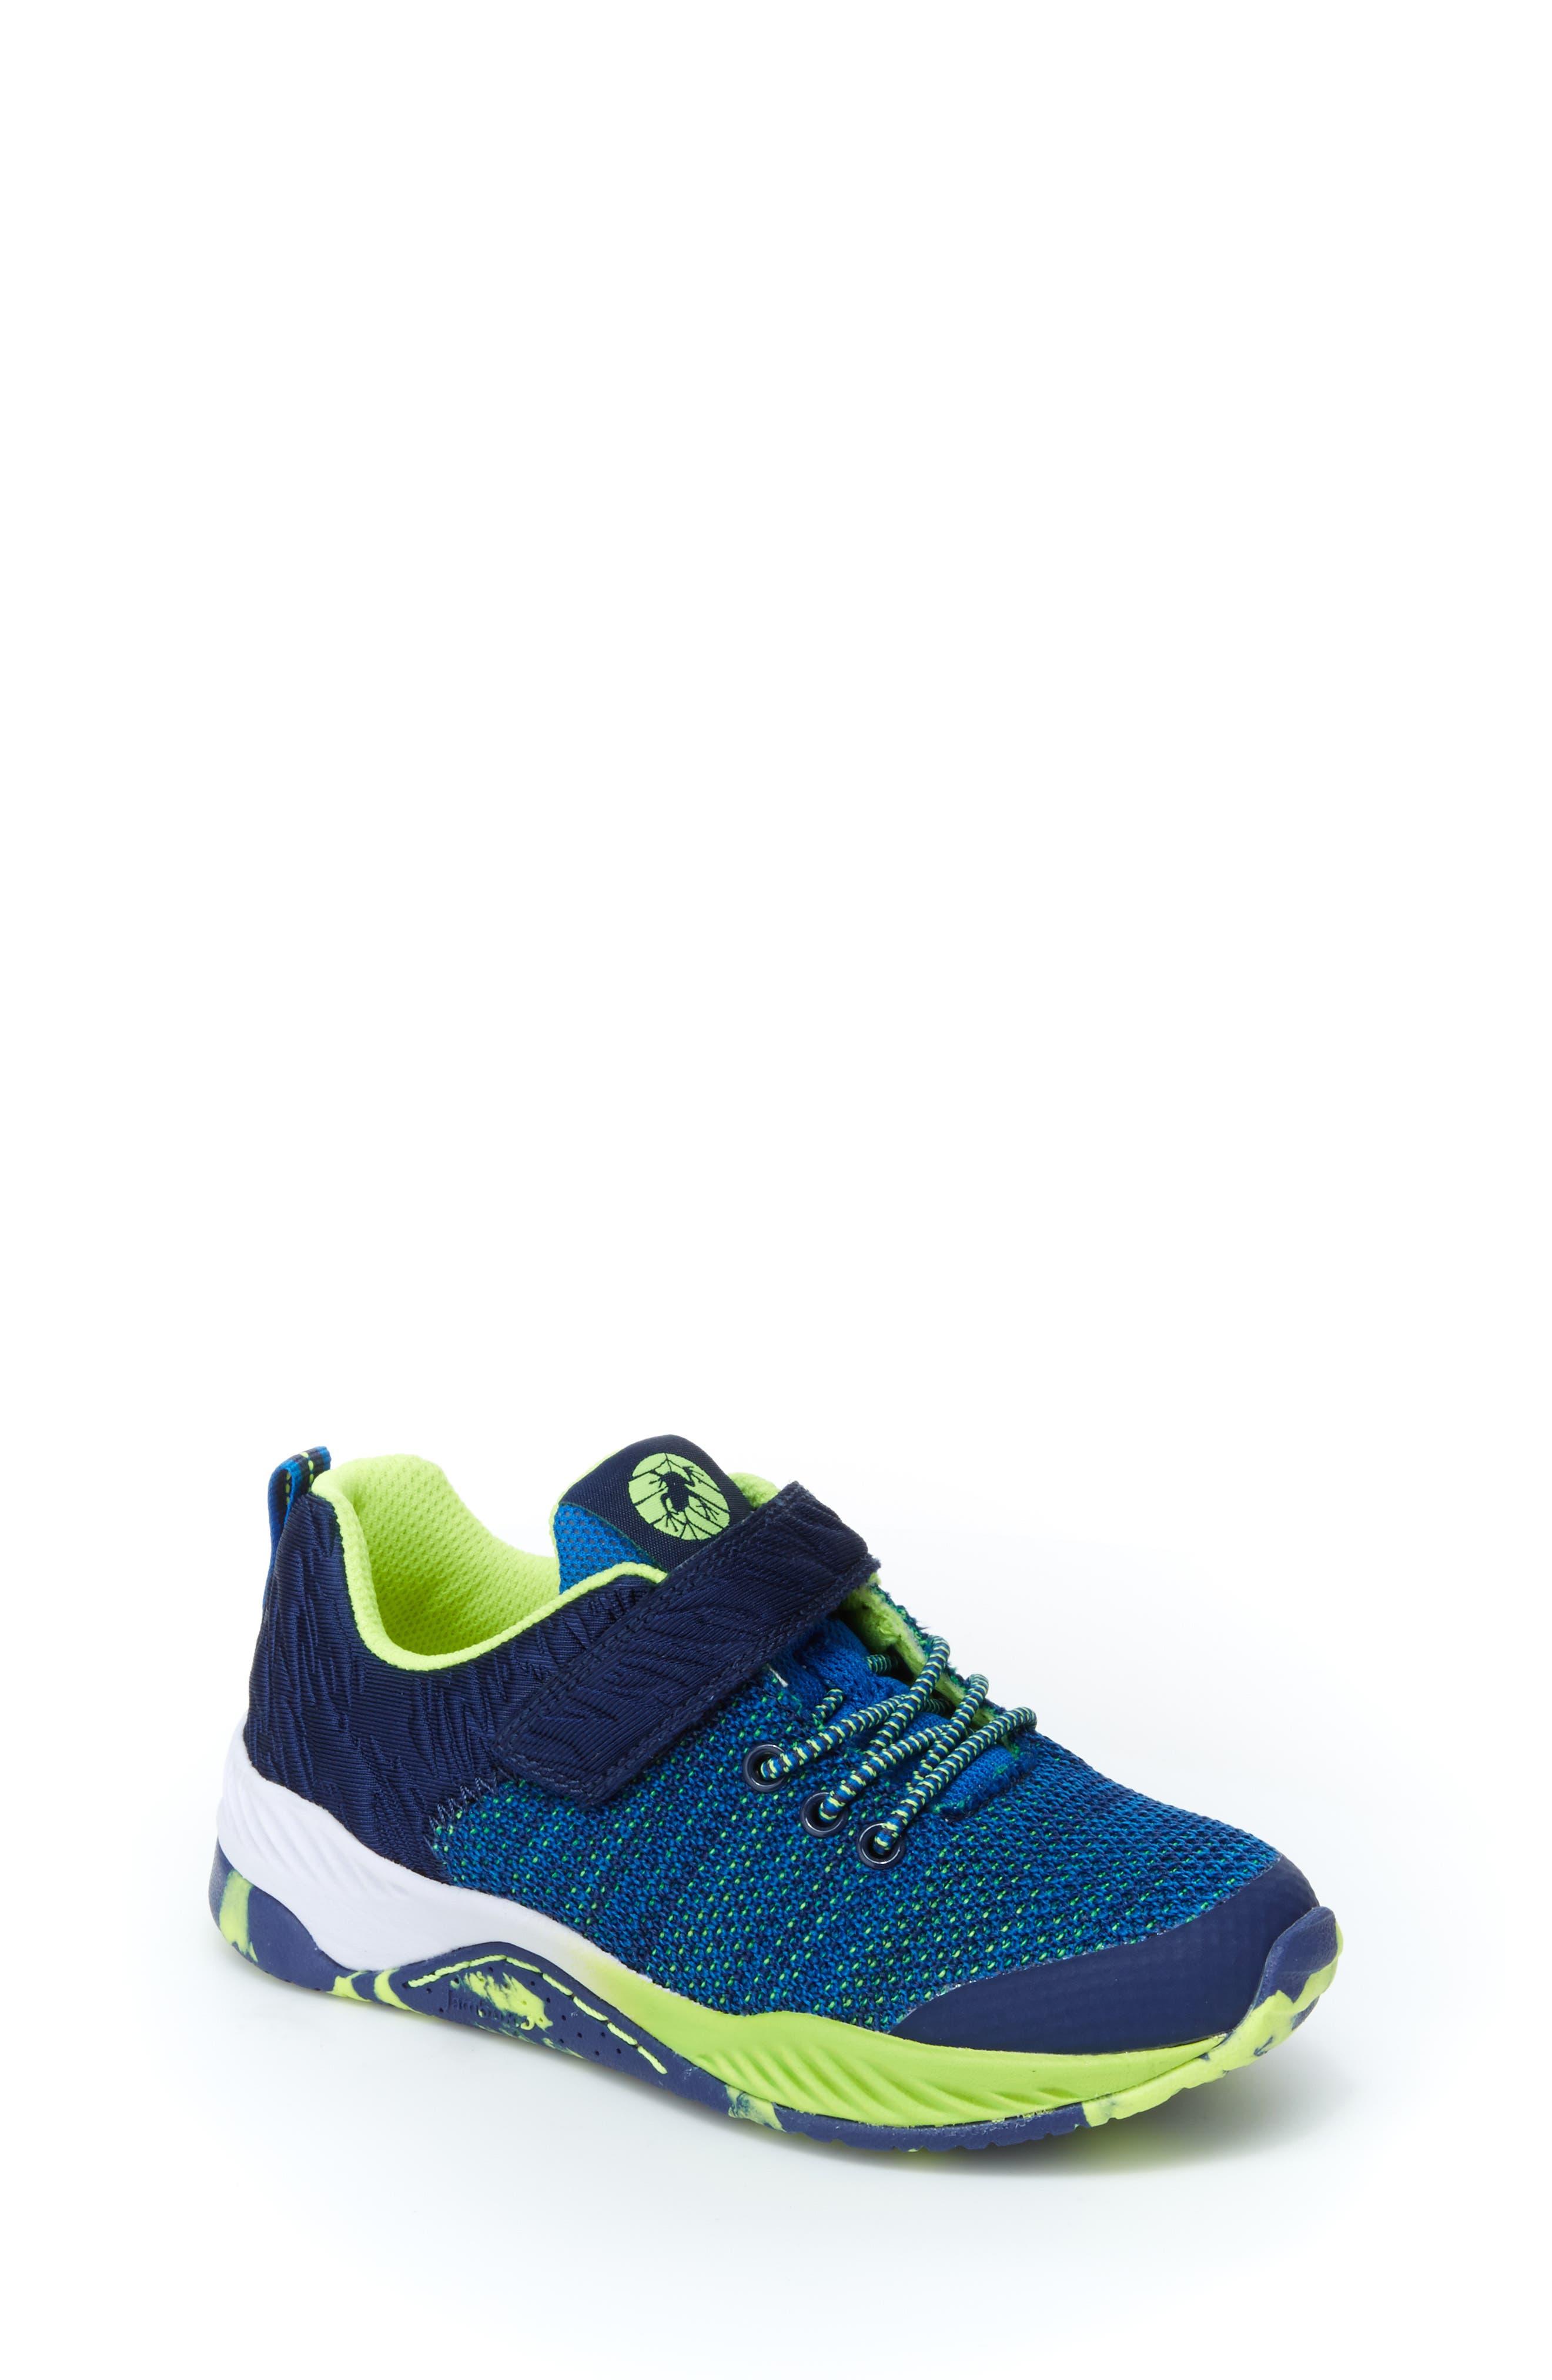 Talon Knit Sneaker,                             Main thumbnail 1, color,                             NAVY TEXTILE